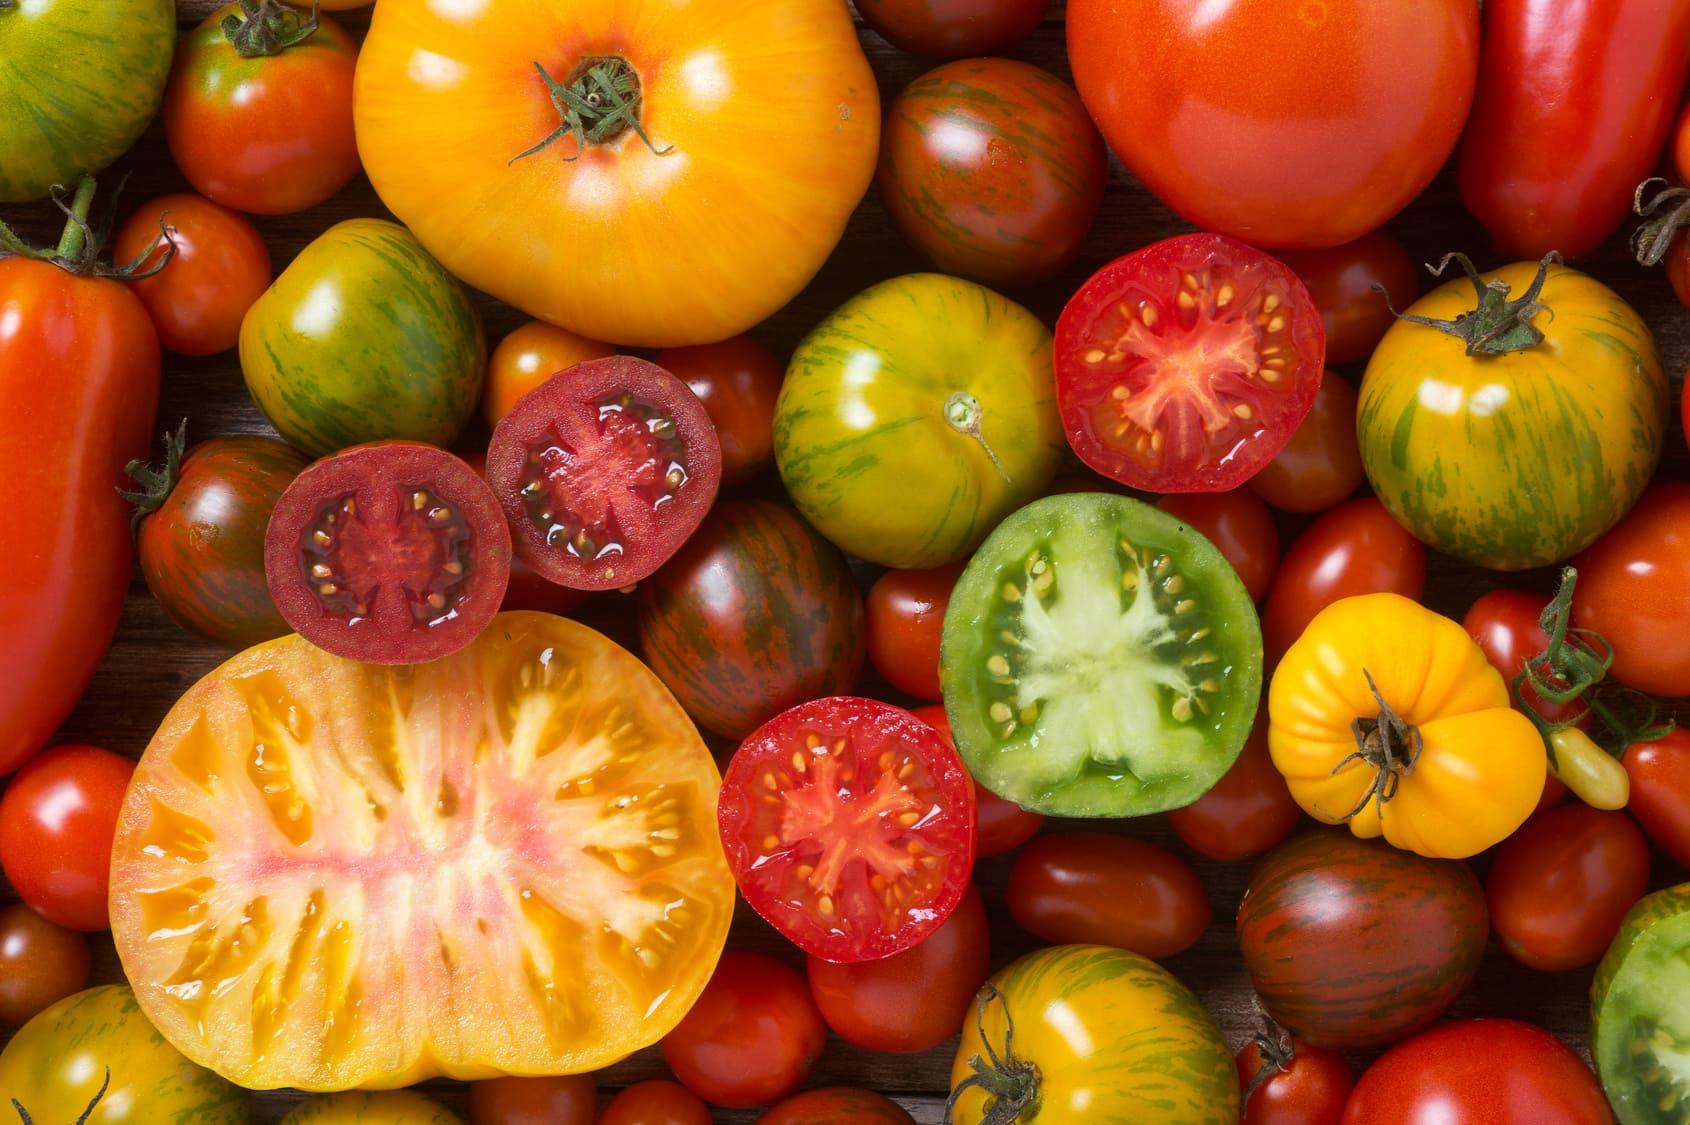 pomodori gialli pomodori neri pomodori rossi